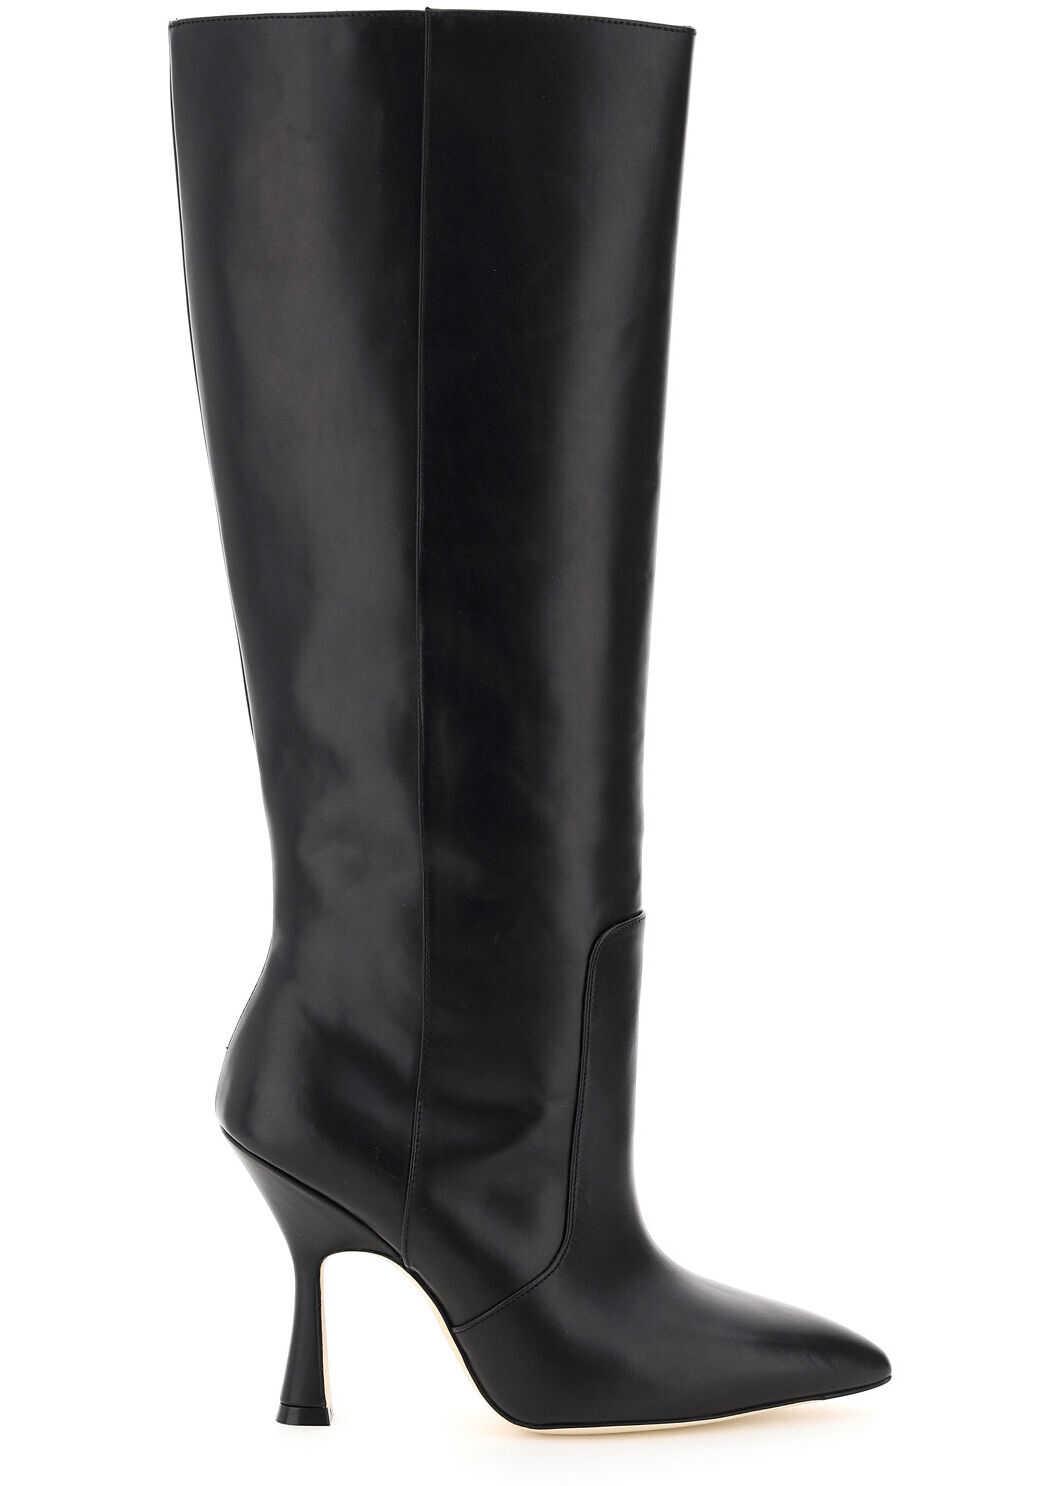 Stuart Weitzman Parton Leather Boots PARTON BLACK imagine b-mall.ro